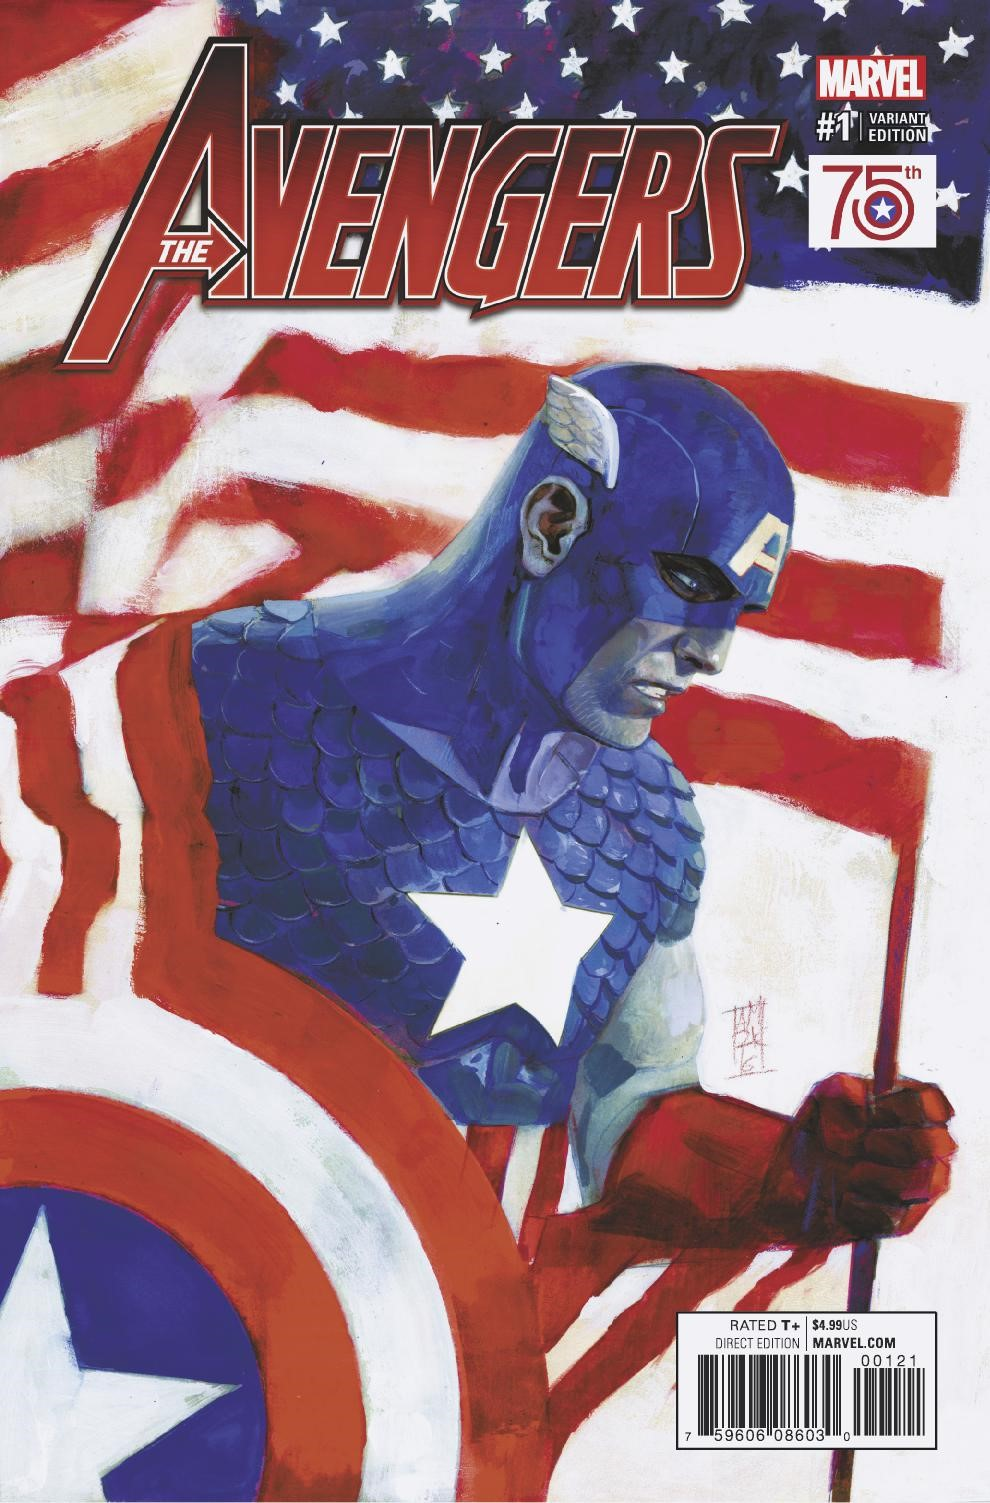 avengers_1_maleev_captain_america_75th_anniversary_variant